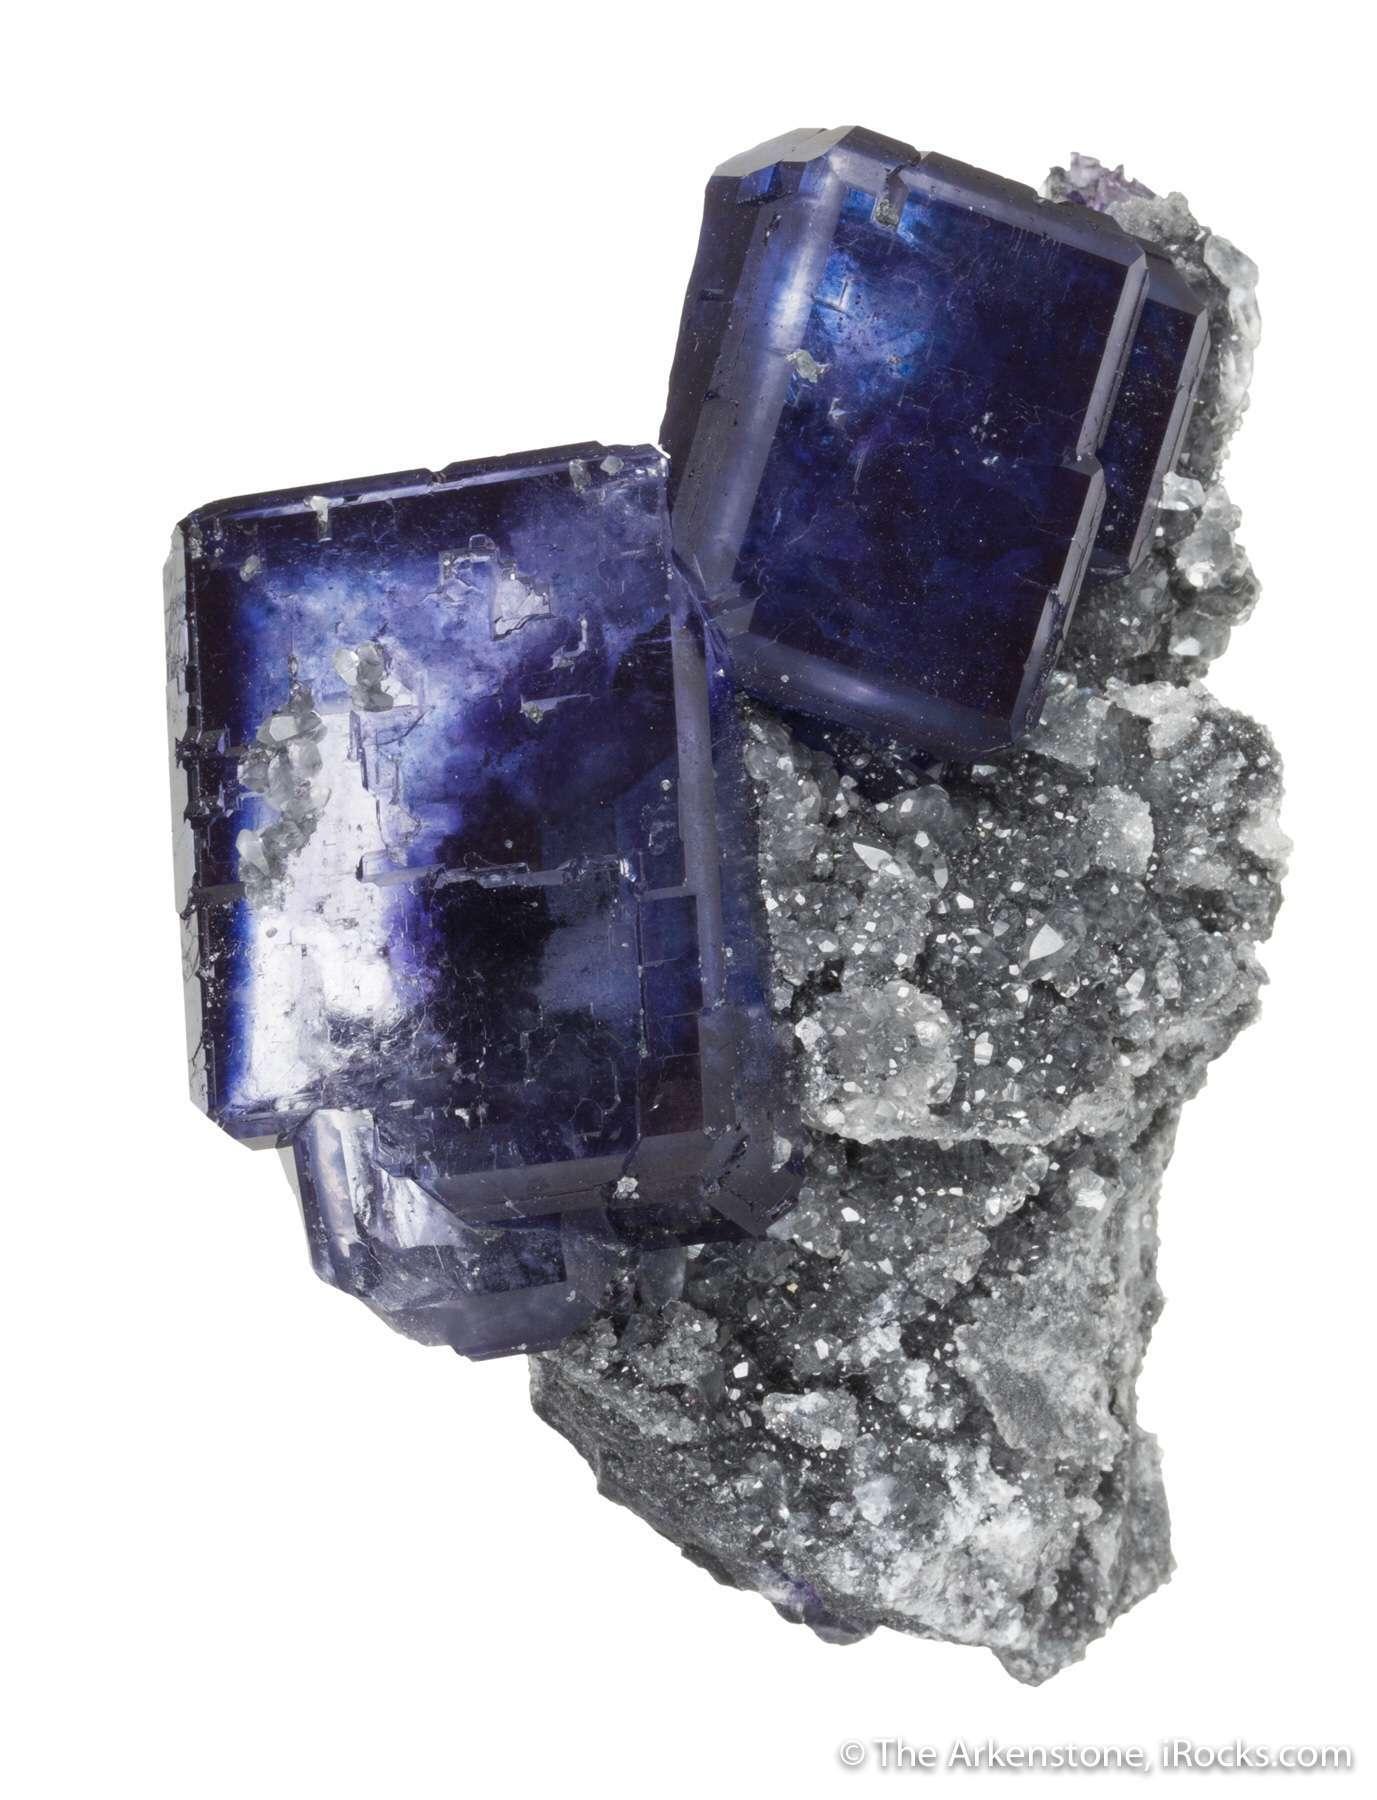 Two large translucent crystals highlight sparkly pedestal matrix